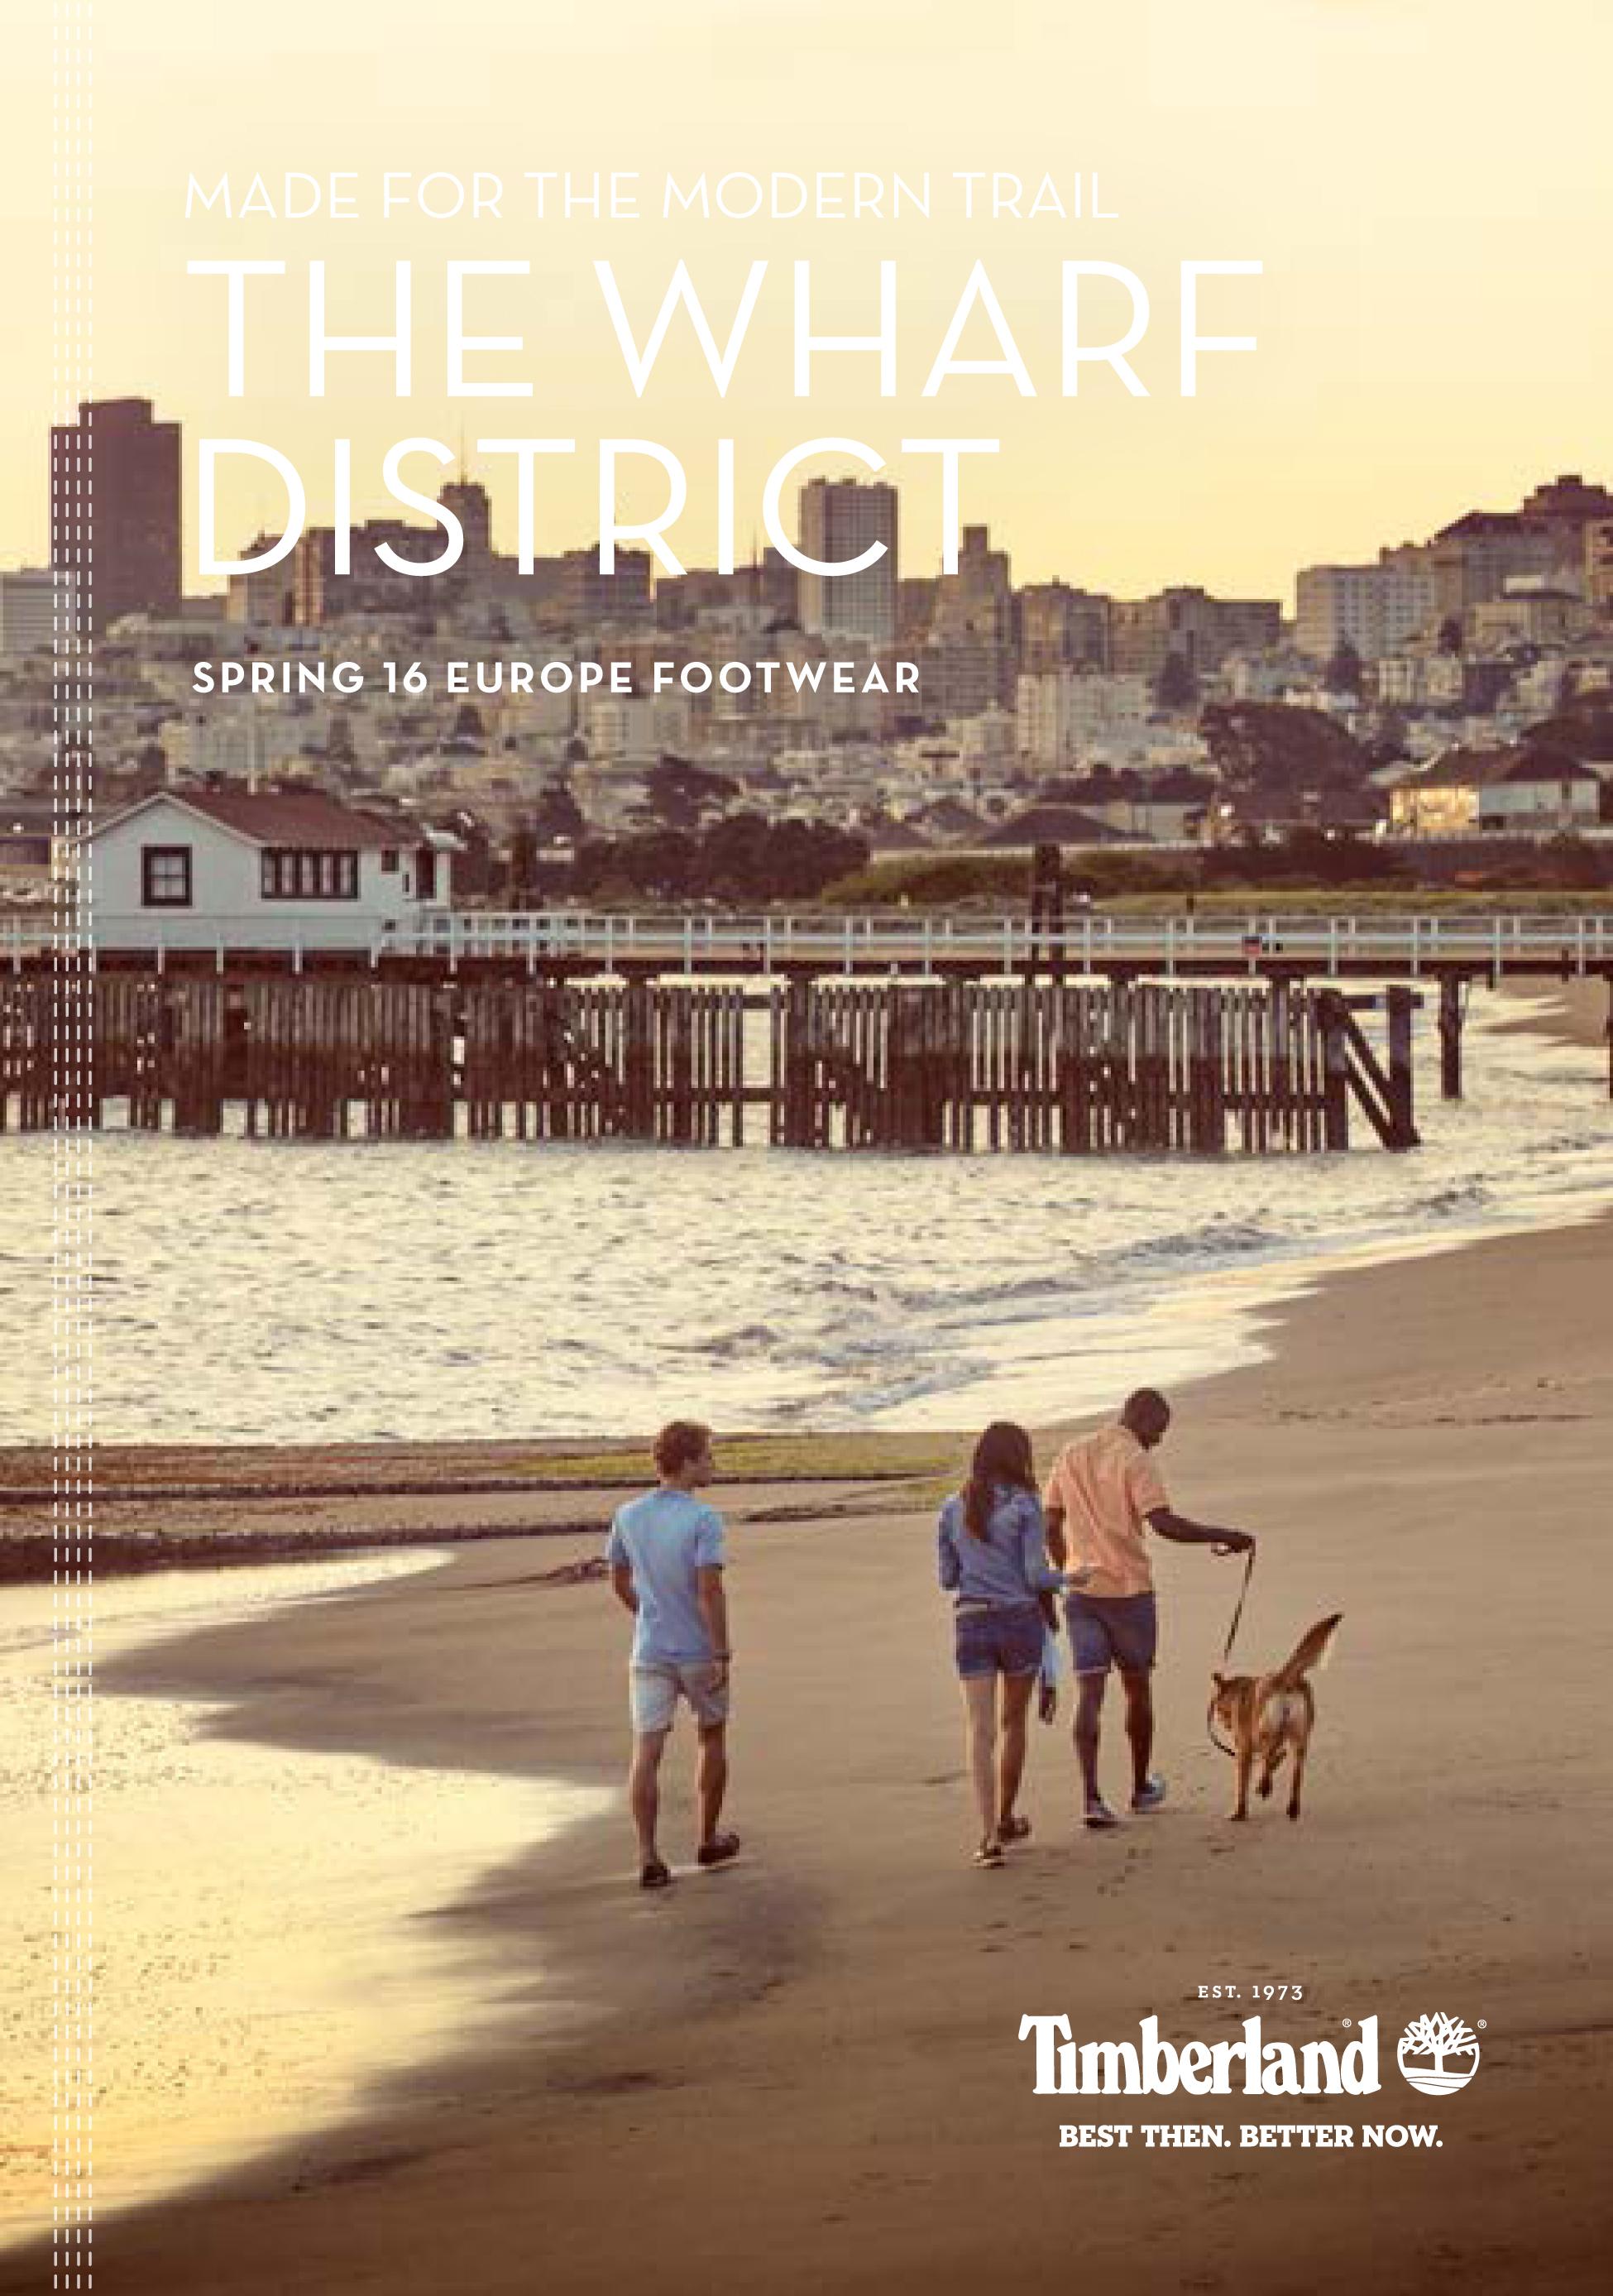 Imagen de portada del lookbook de calzado TIMBERLAND pv 2016.